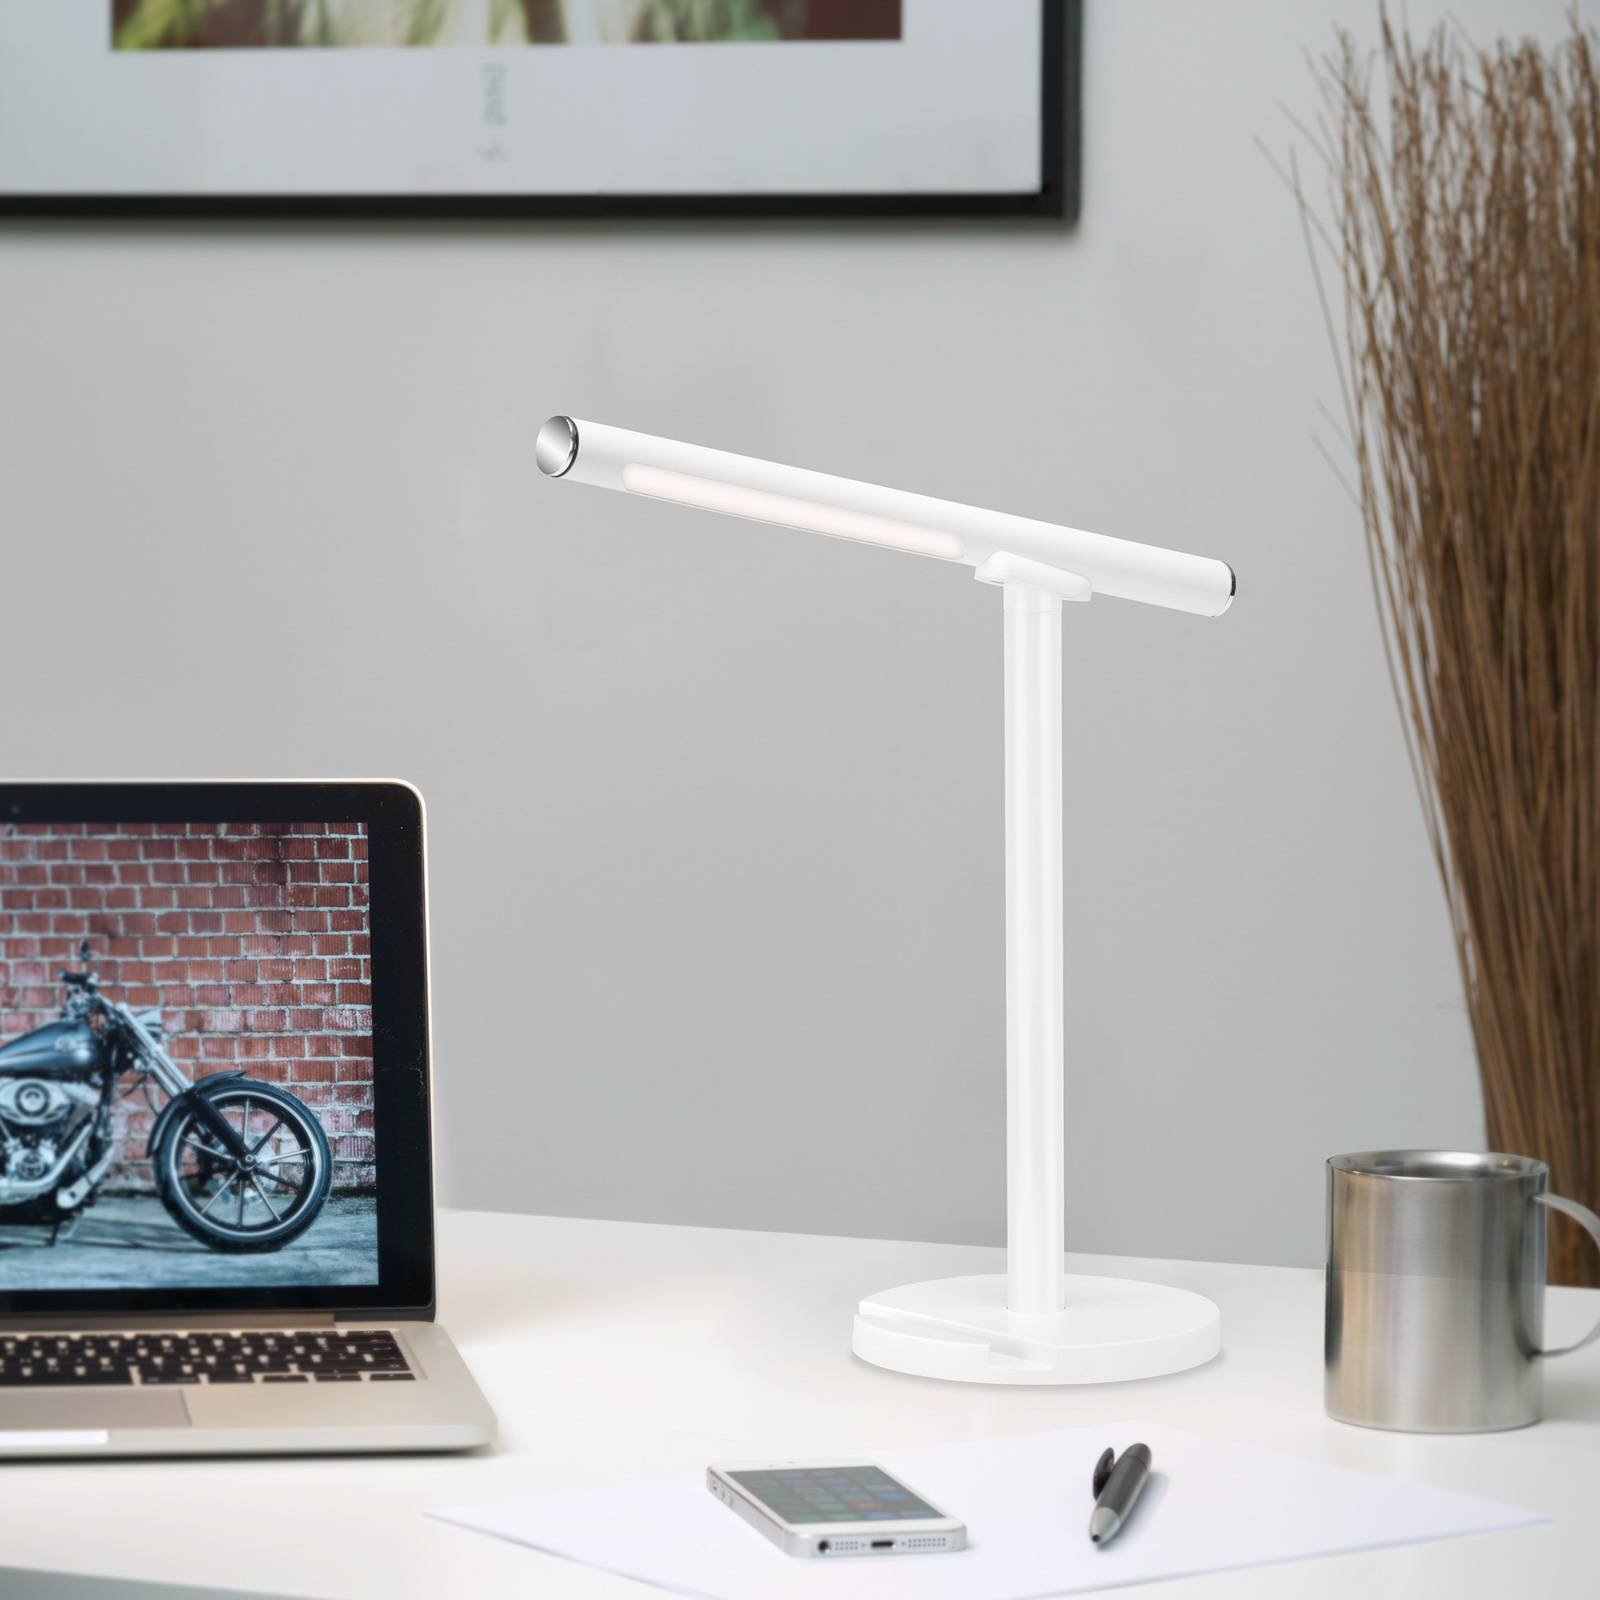 LED-bordlampe Everywhere, USB med batteri, hvit